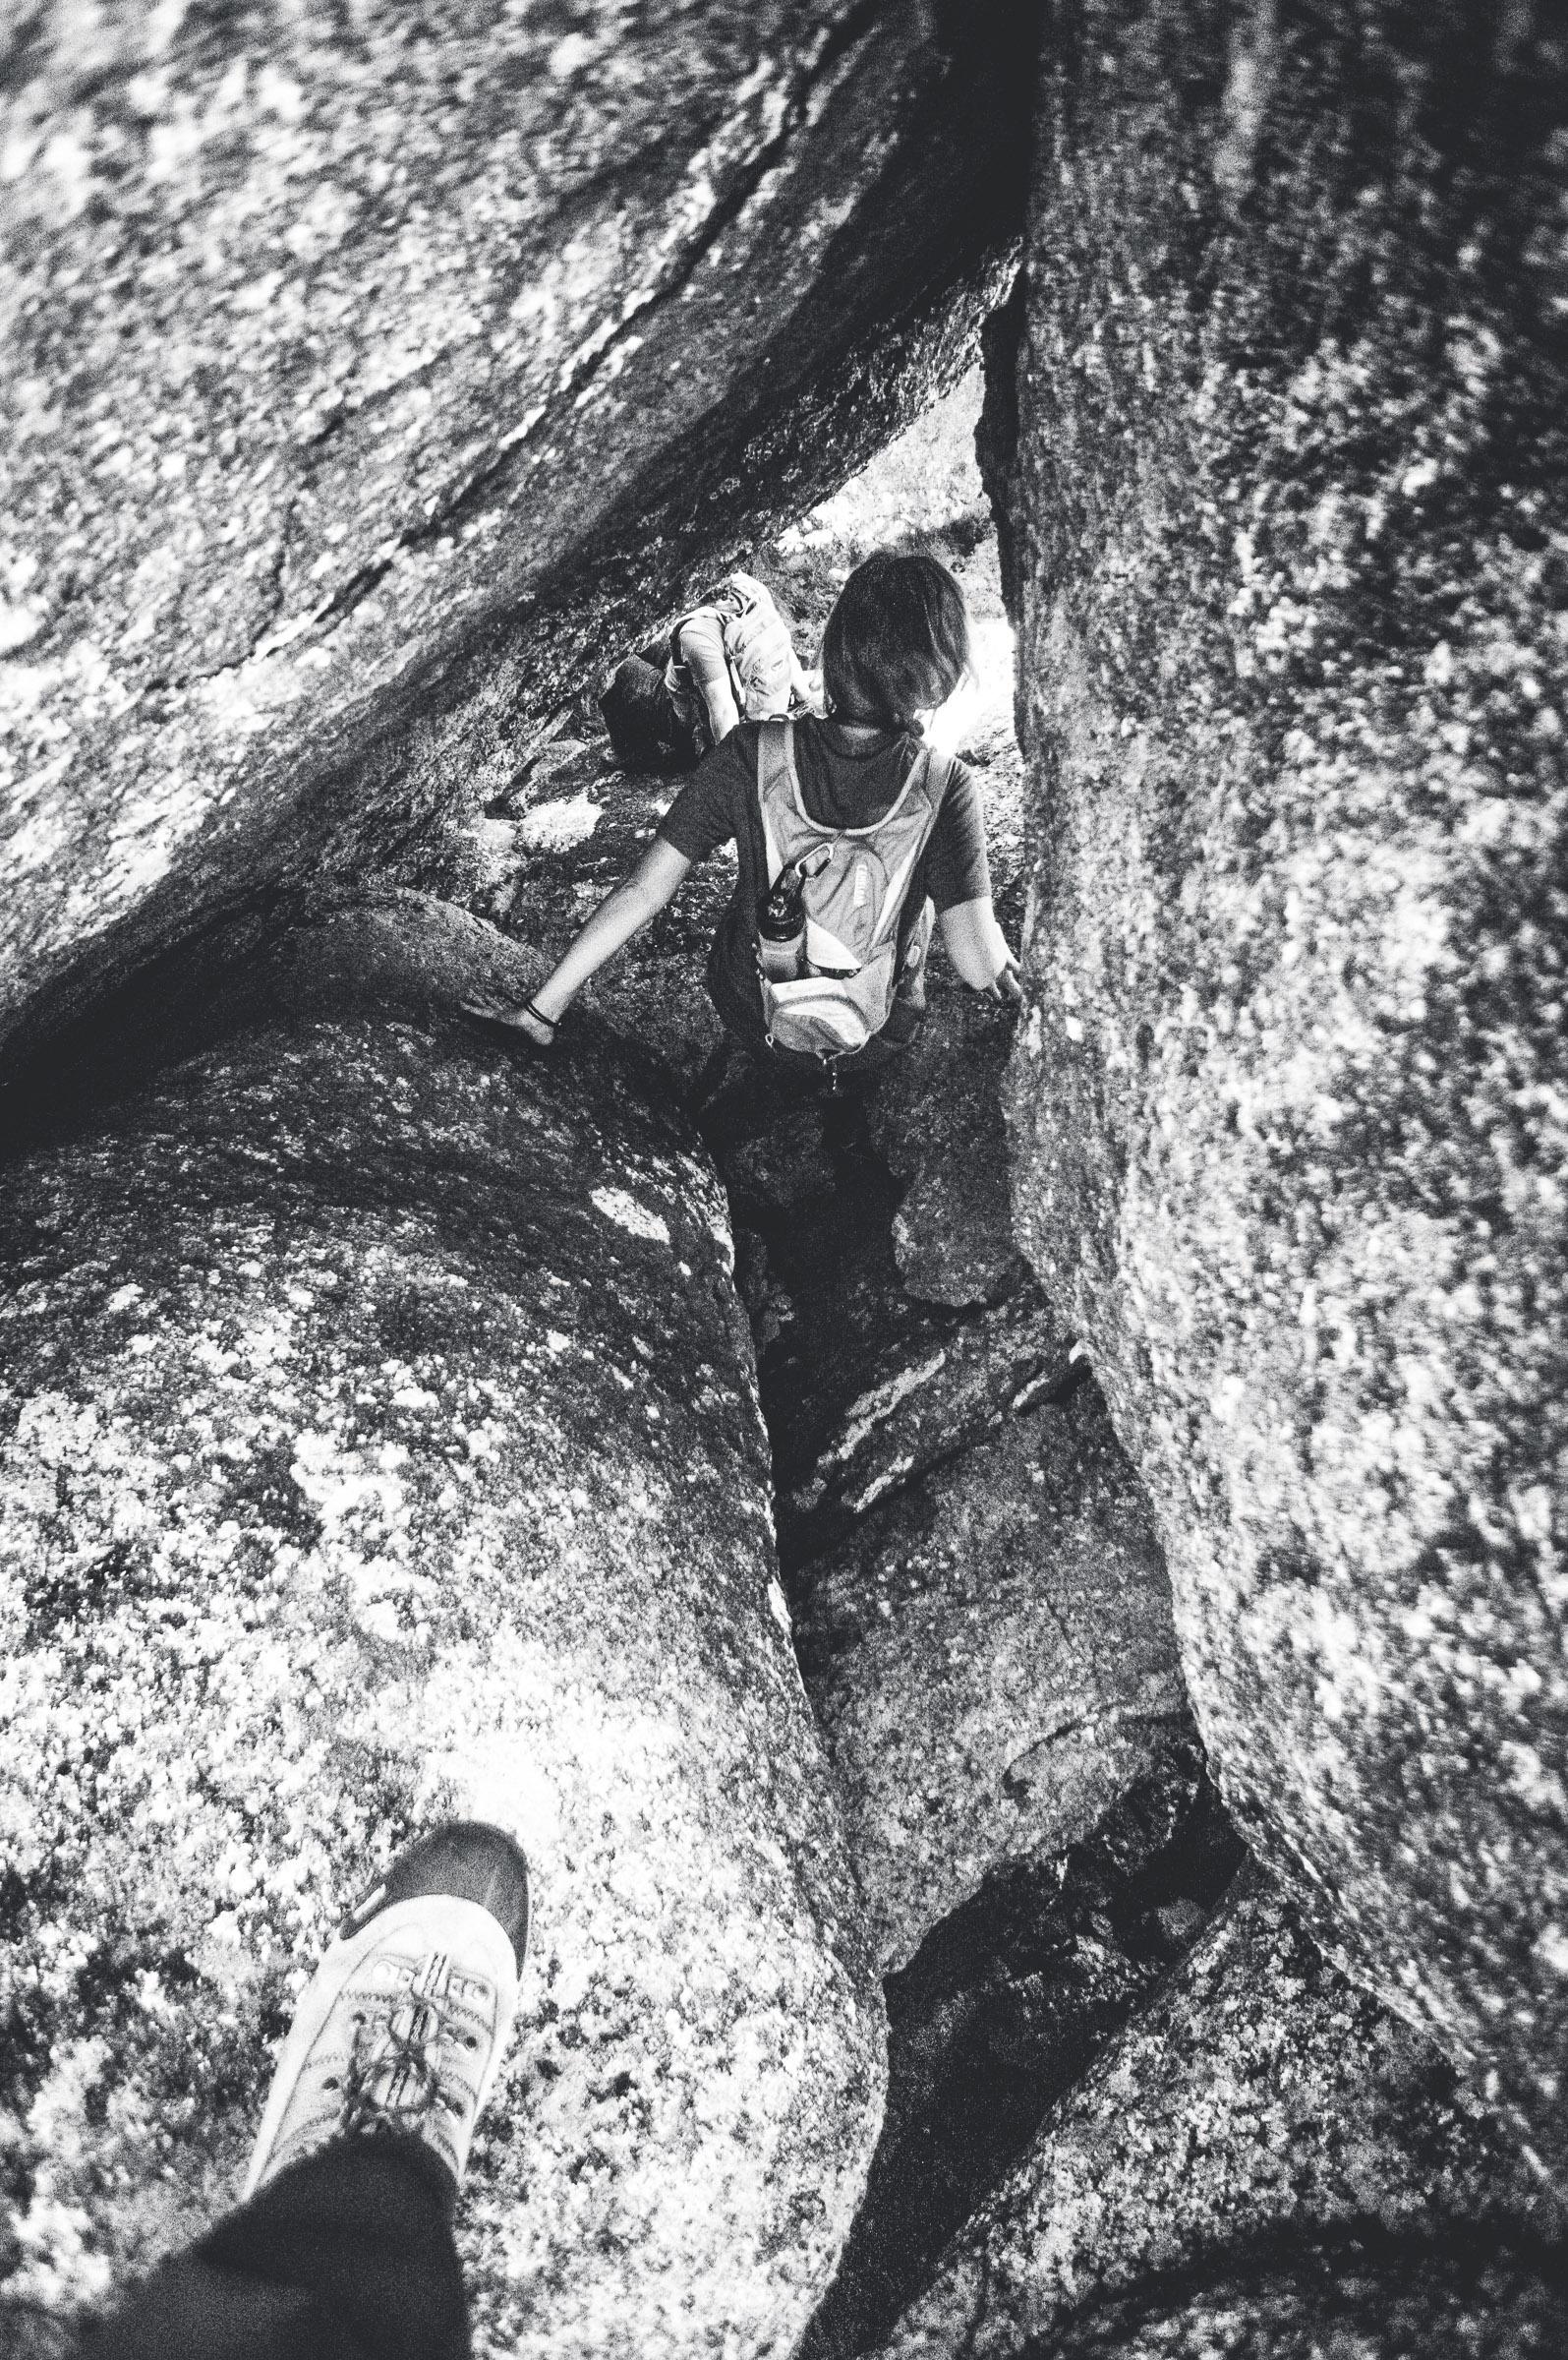 Spanish Cave 11-12-16 B&W (32 of 33).JPG